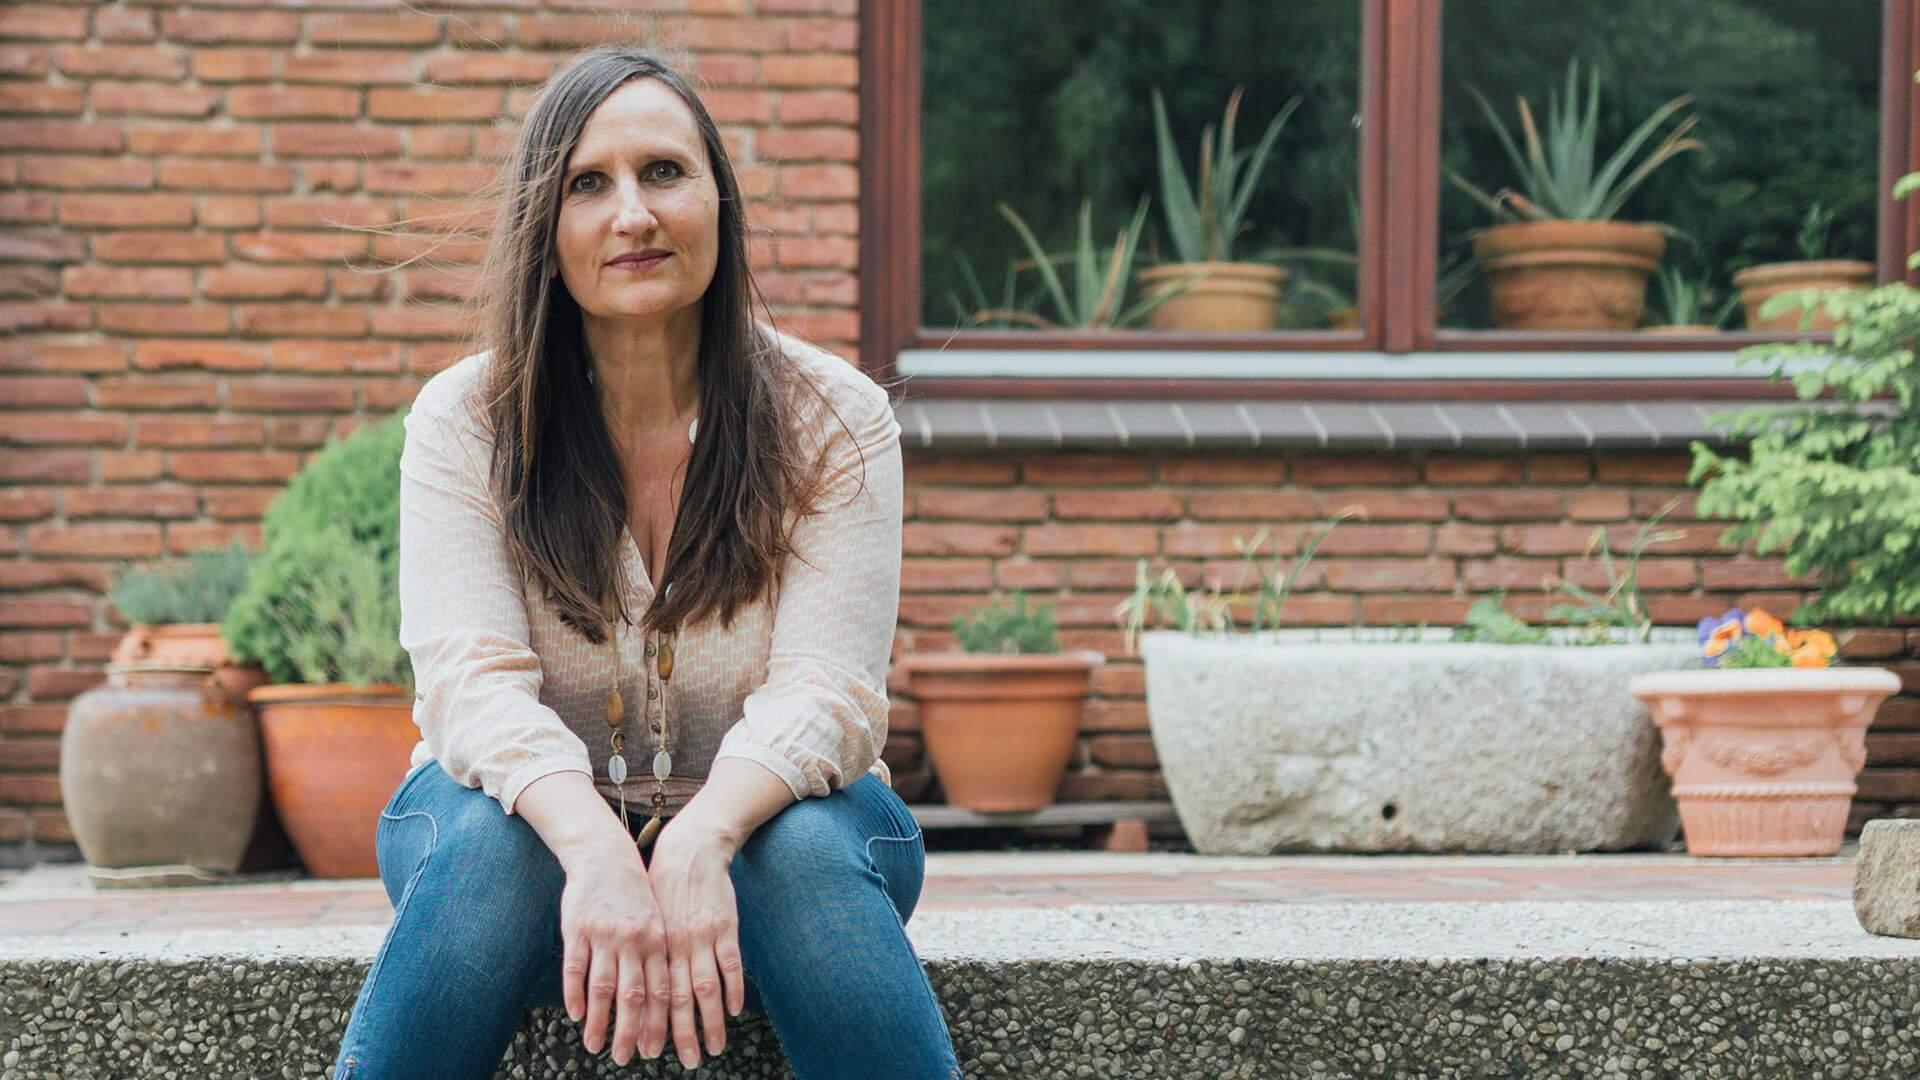 Johanna Stüttgen OrdnungsCoach & Organizer. Lübecker Bucht, Timmendorfer Strand & Online. Zuhause & Business